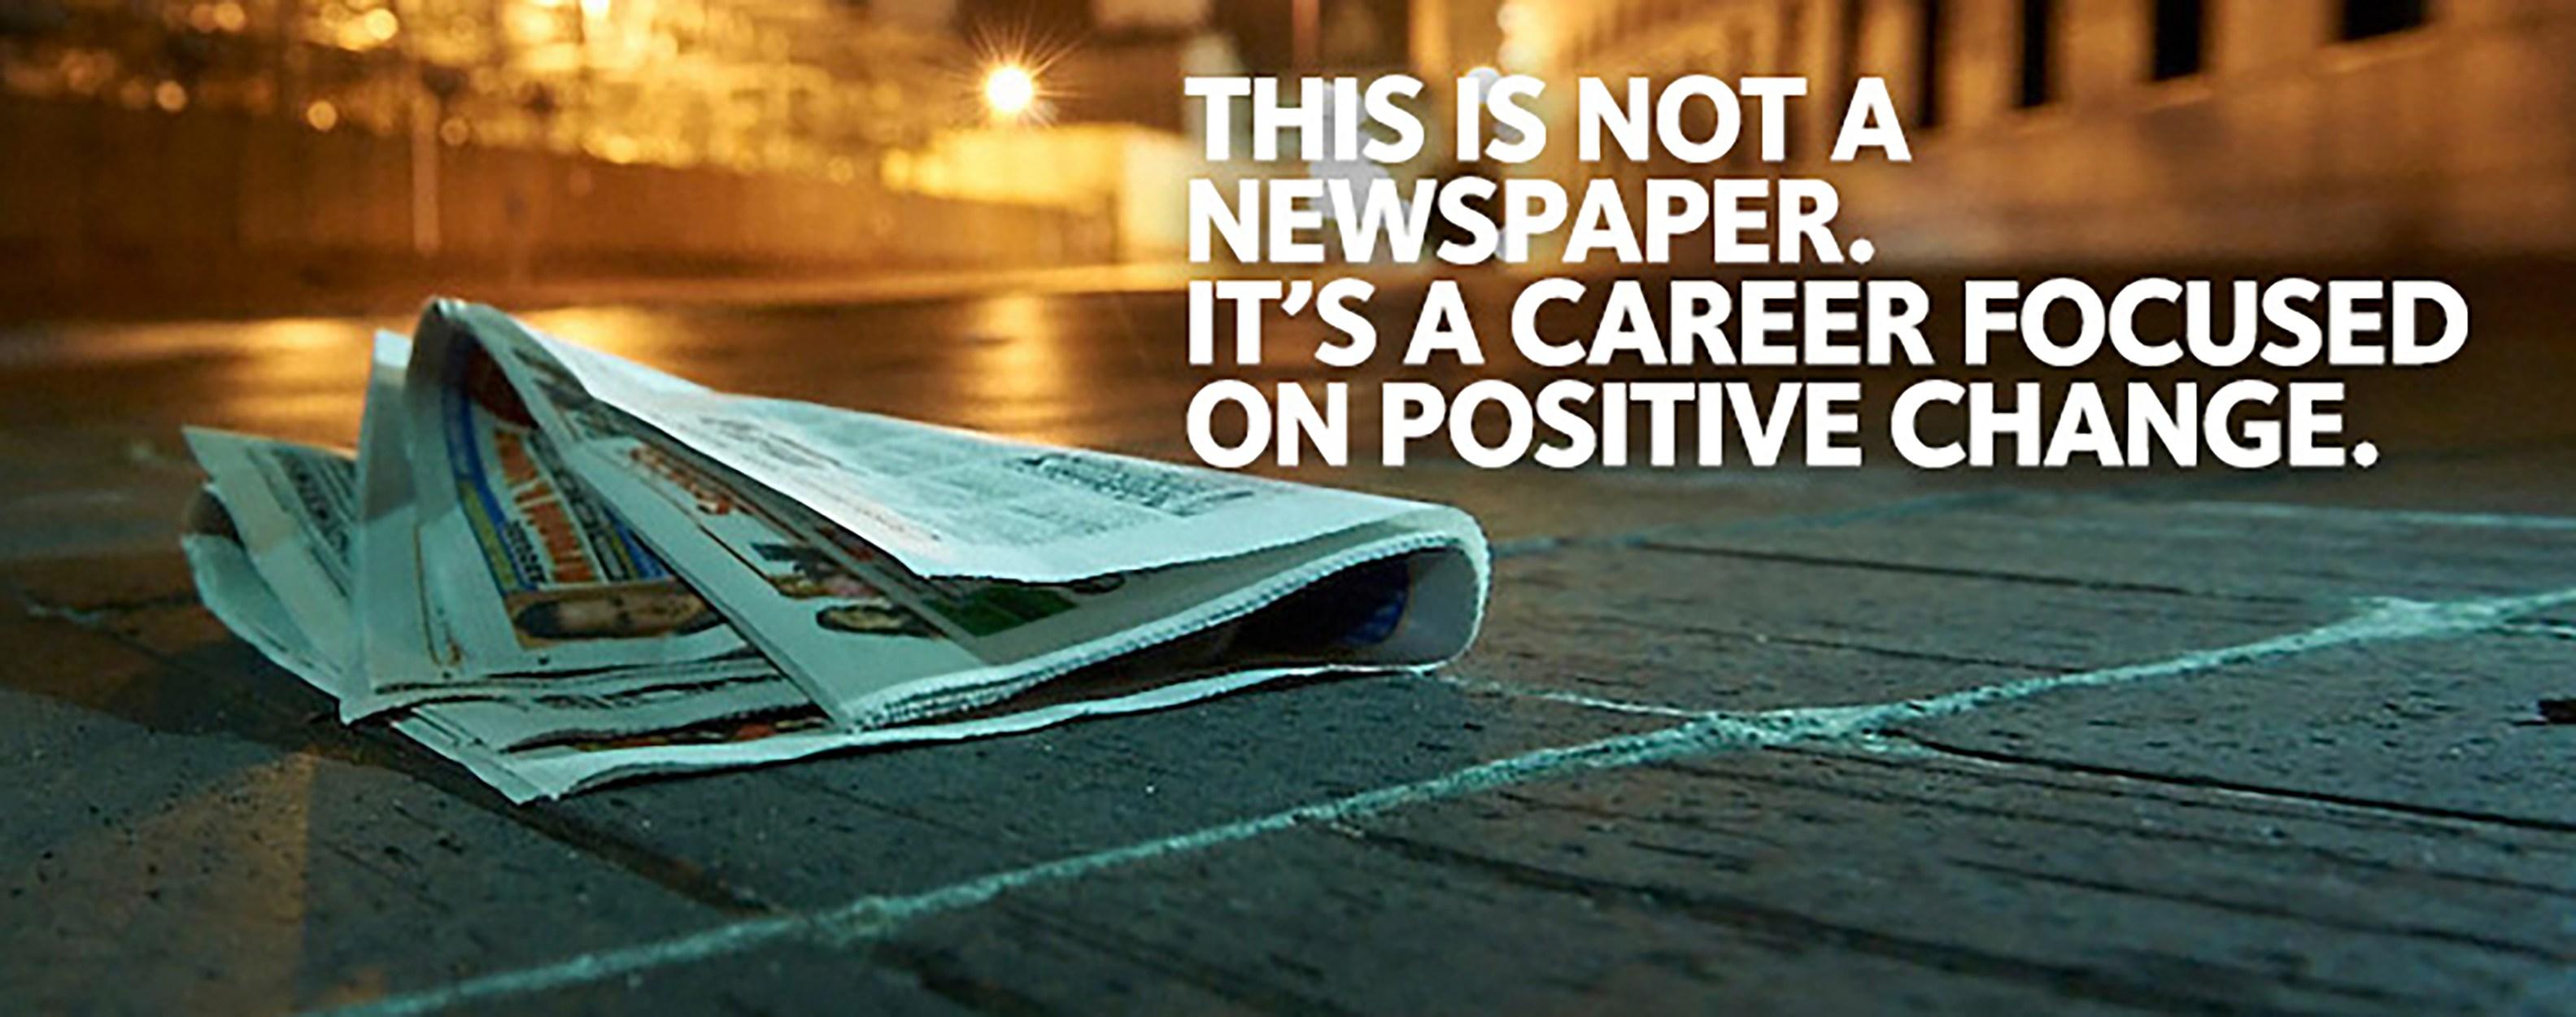 paper-image